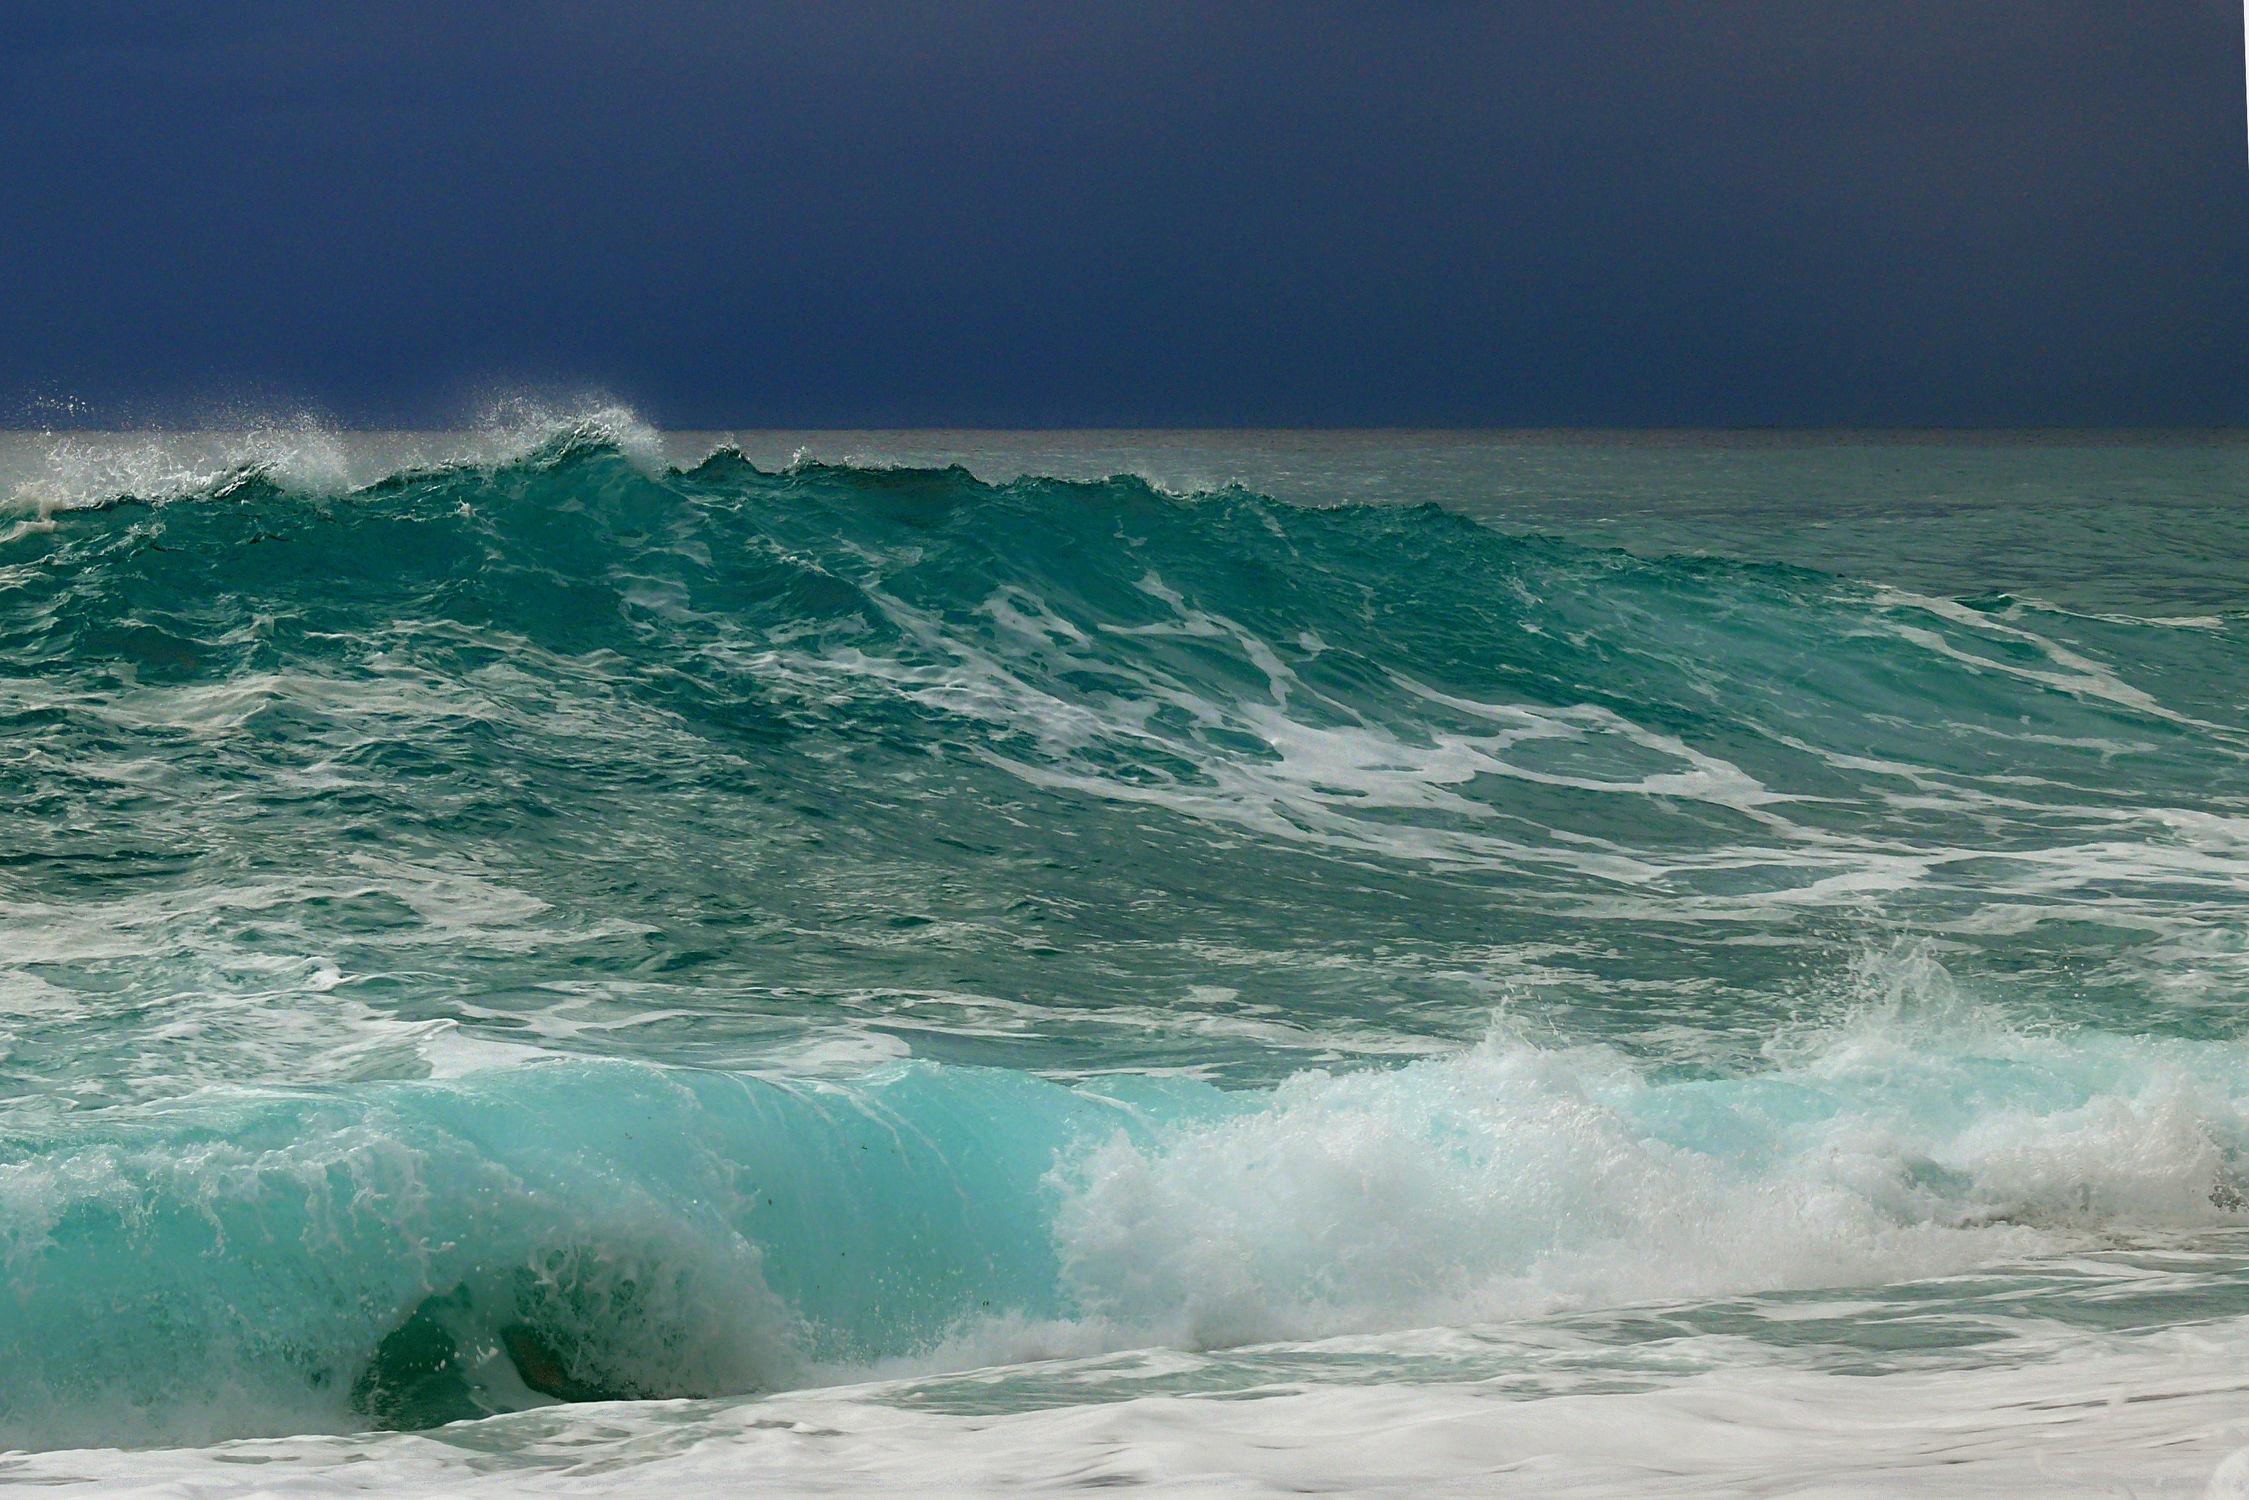 Bild mit Wellen, Urlaub, Türkis, Strand, Meer, Reisen, Wärme, südeuropa, Kreta, Wogen, Südkreta, Ãgäis